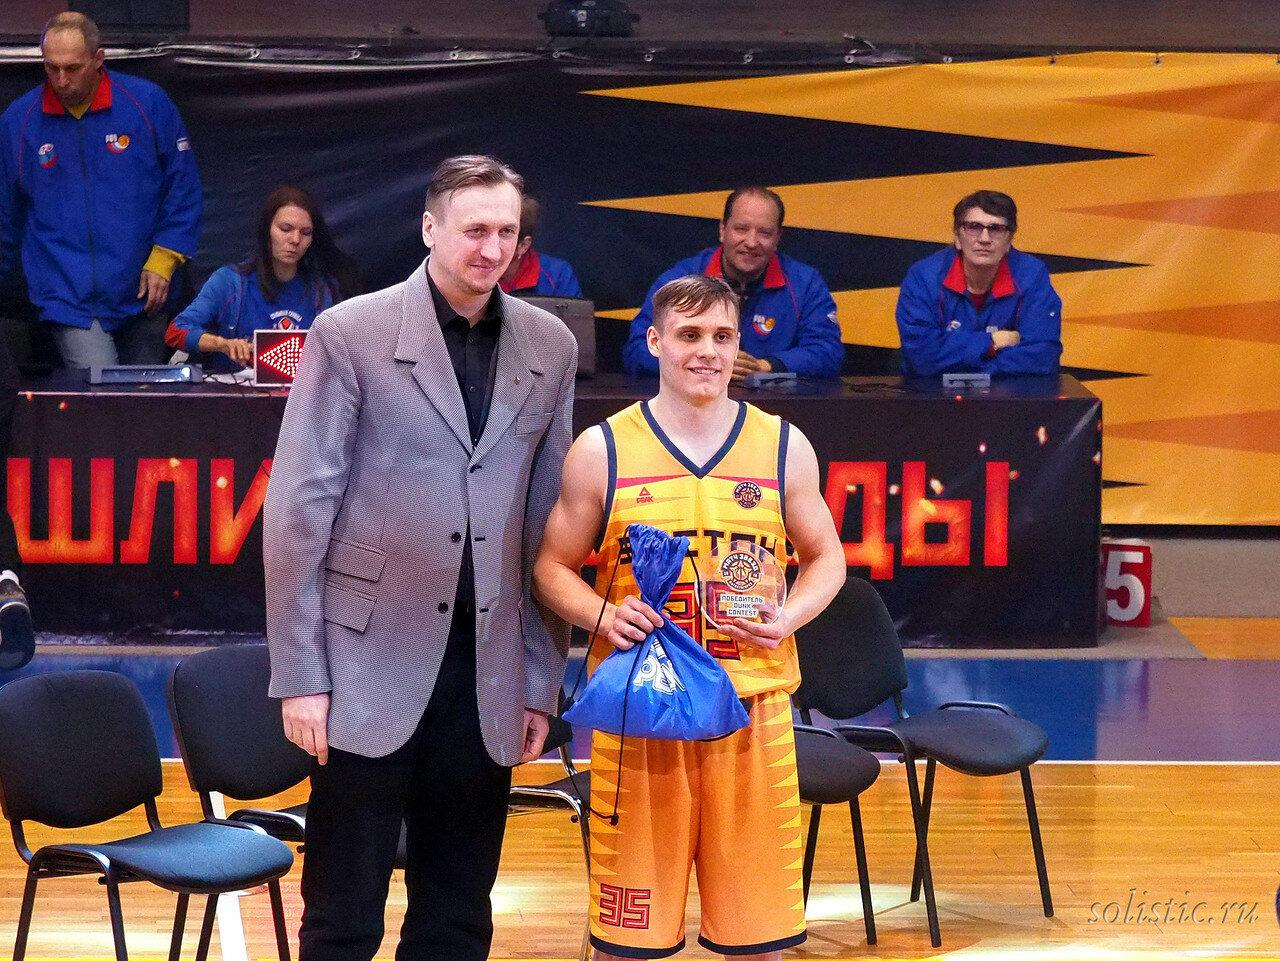 128 Матч звезд АСБ 2018 (ассоциации студенческого баскетбола)